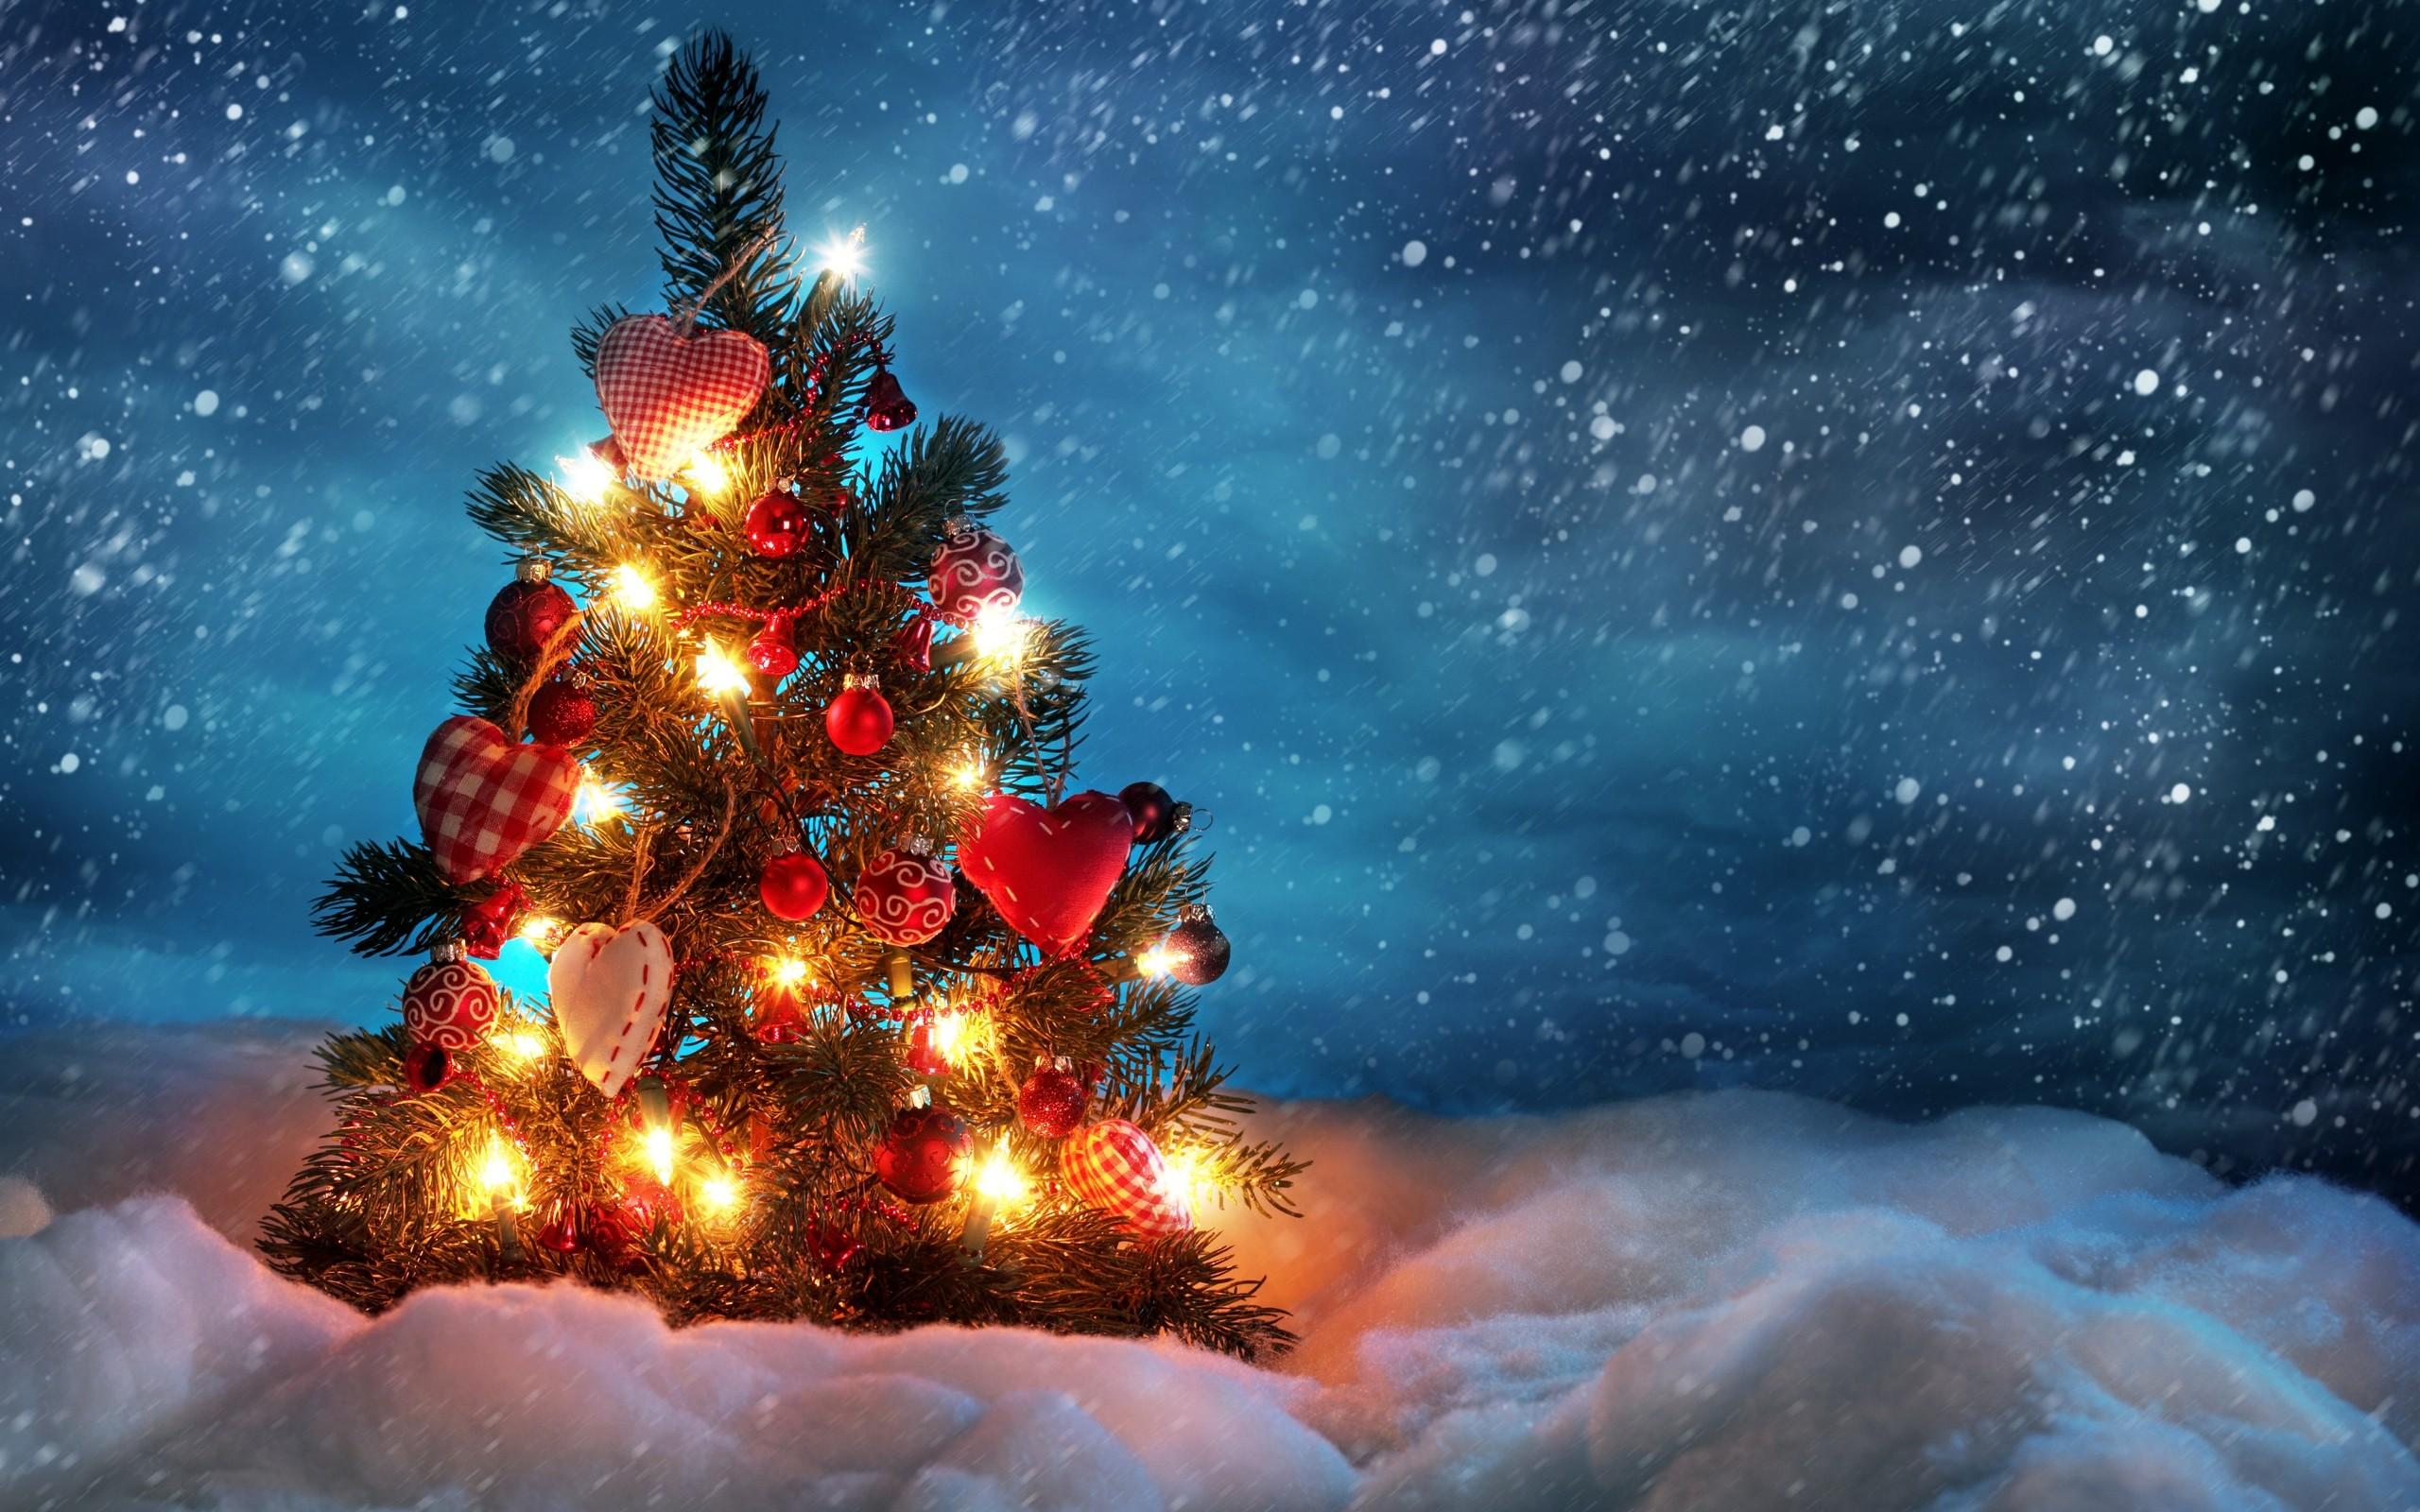 1061) Christmas Tree Animated Desktop Background Wallpaper .